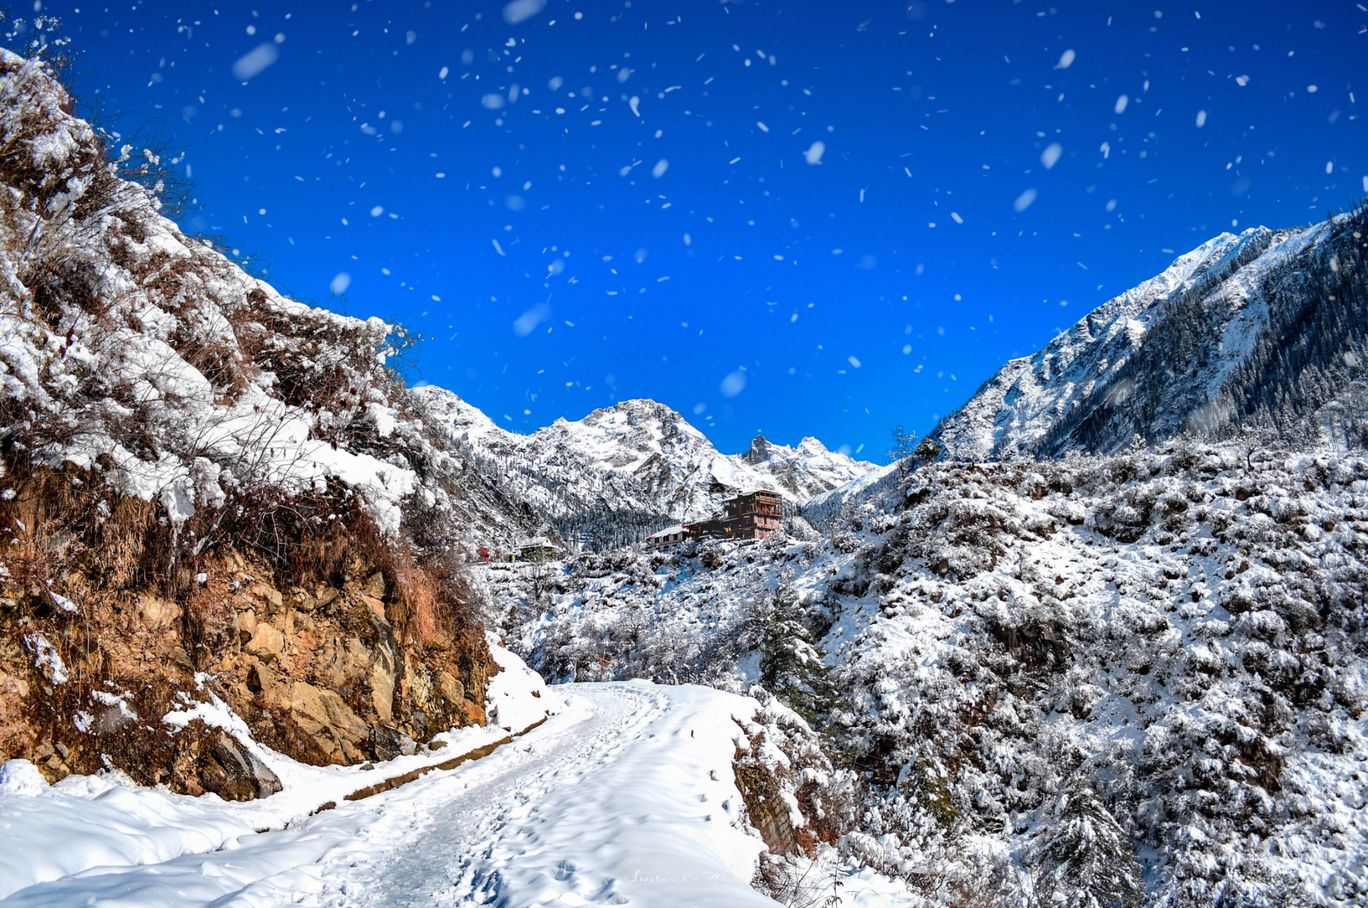 Photo of Himachal Pradesh By Swetanshu Arun